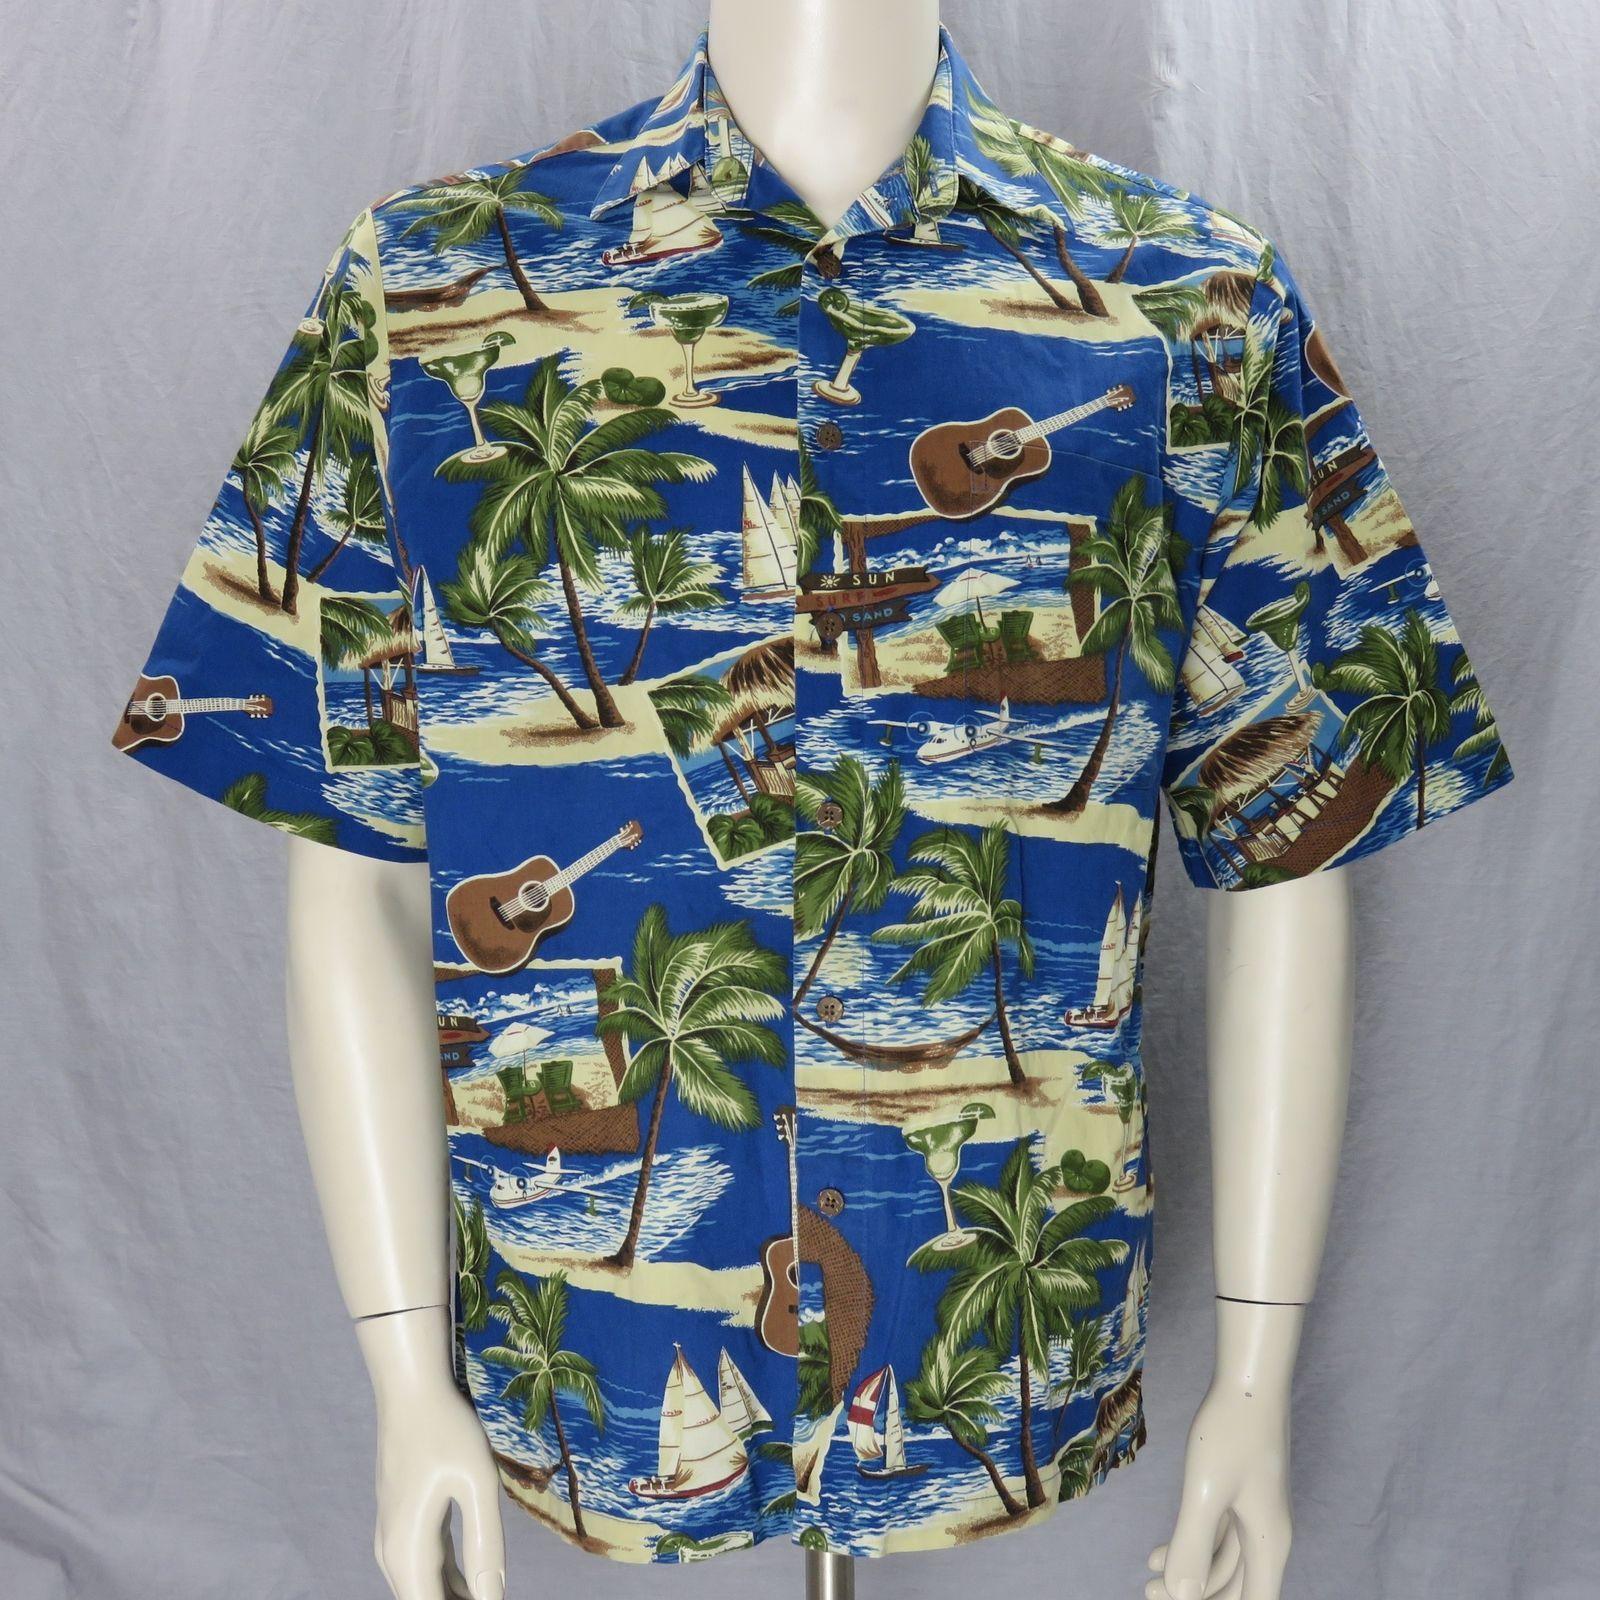 e382af89 Joe Kealohas Reyn Spooner Hawaiian Shirt Medium Sun Surf Sand Matching  Pocket